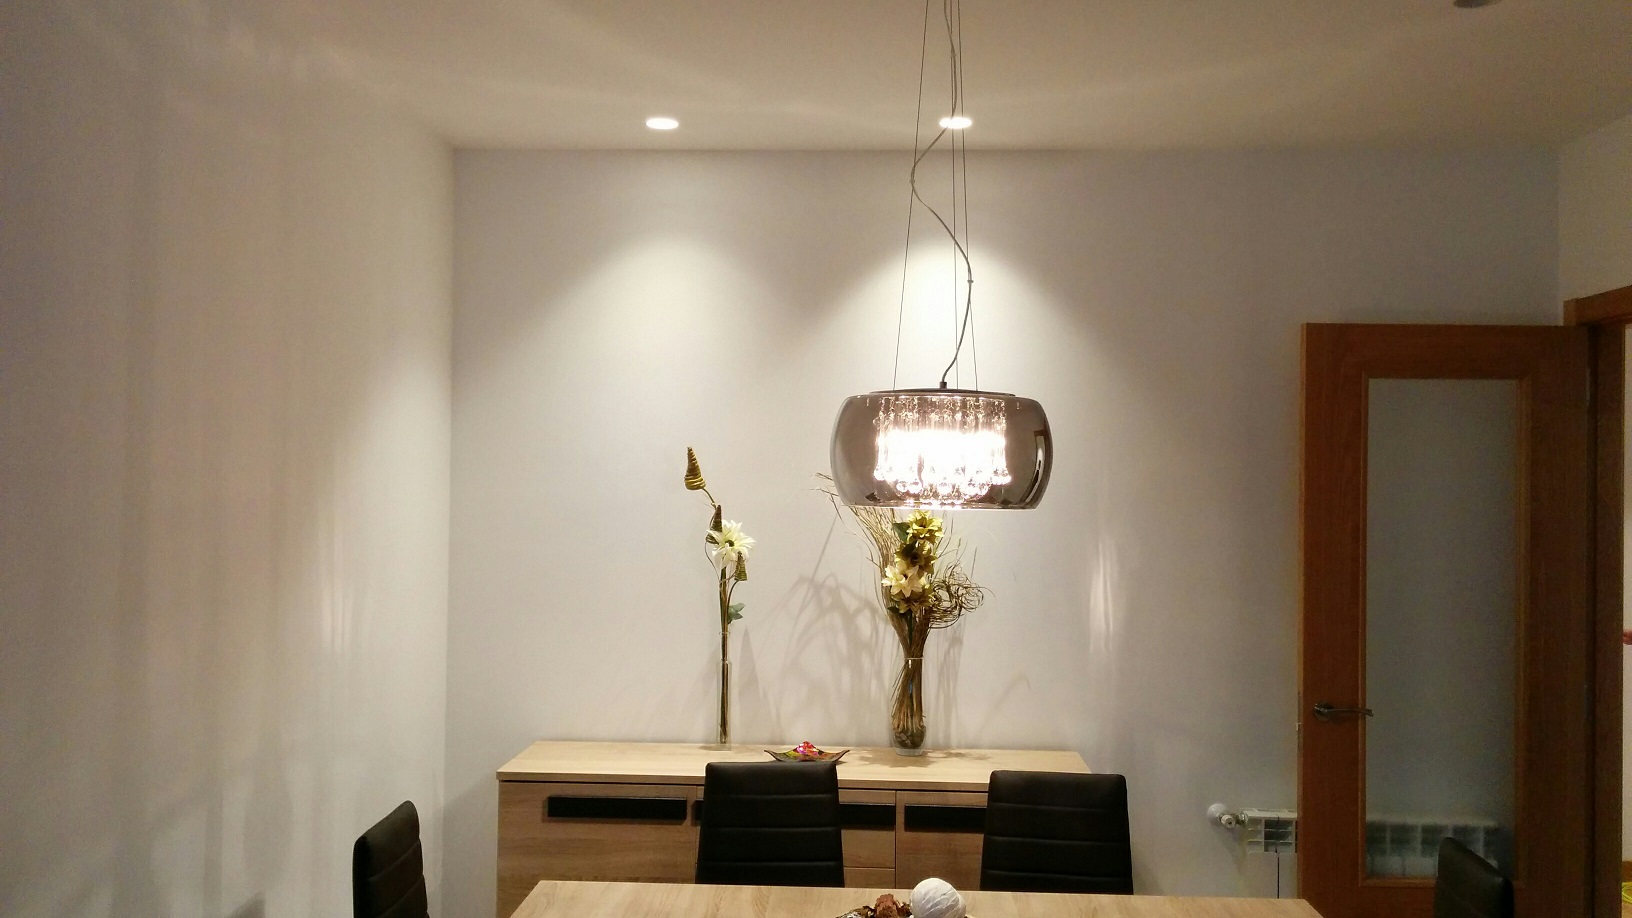 Schuller argos wall lamp g9 led 6w chrome 509327 - Lamparas schuller ...